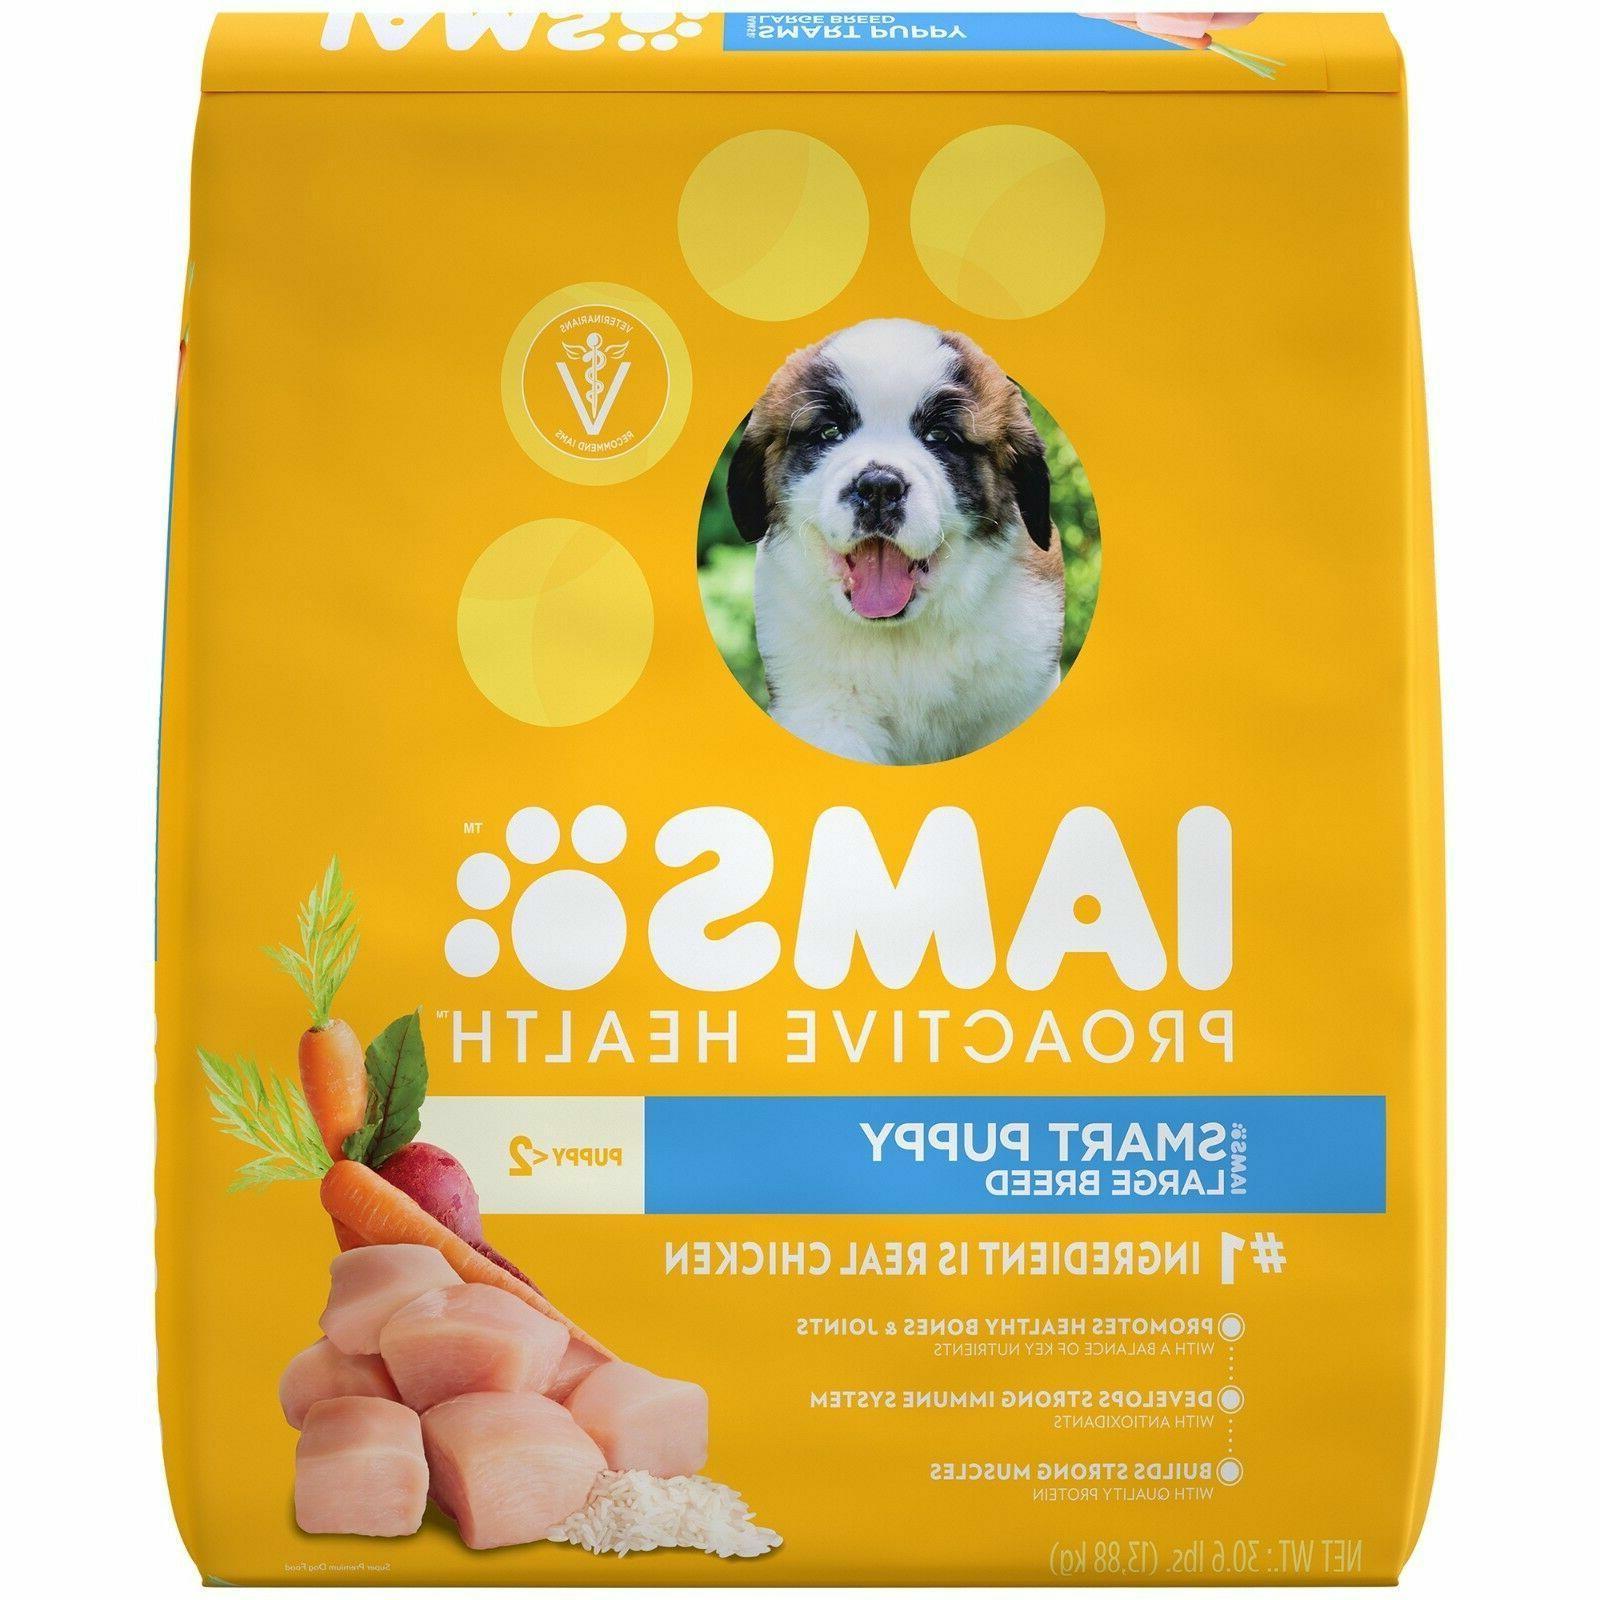 IAMS PROACTIVE HEALTH Puppy Dog Food lb. Bag